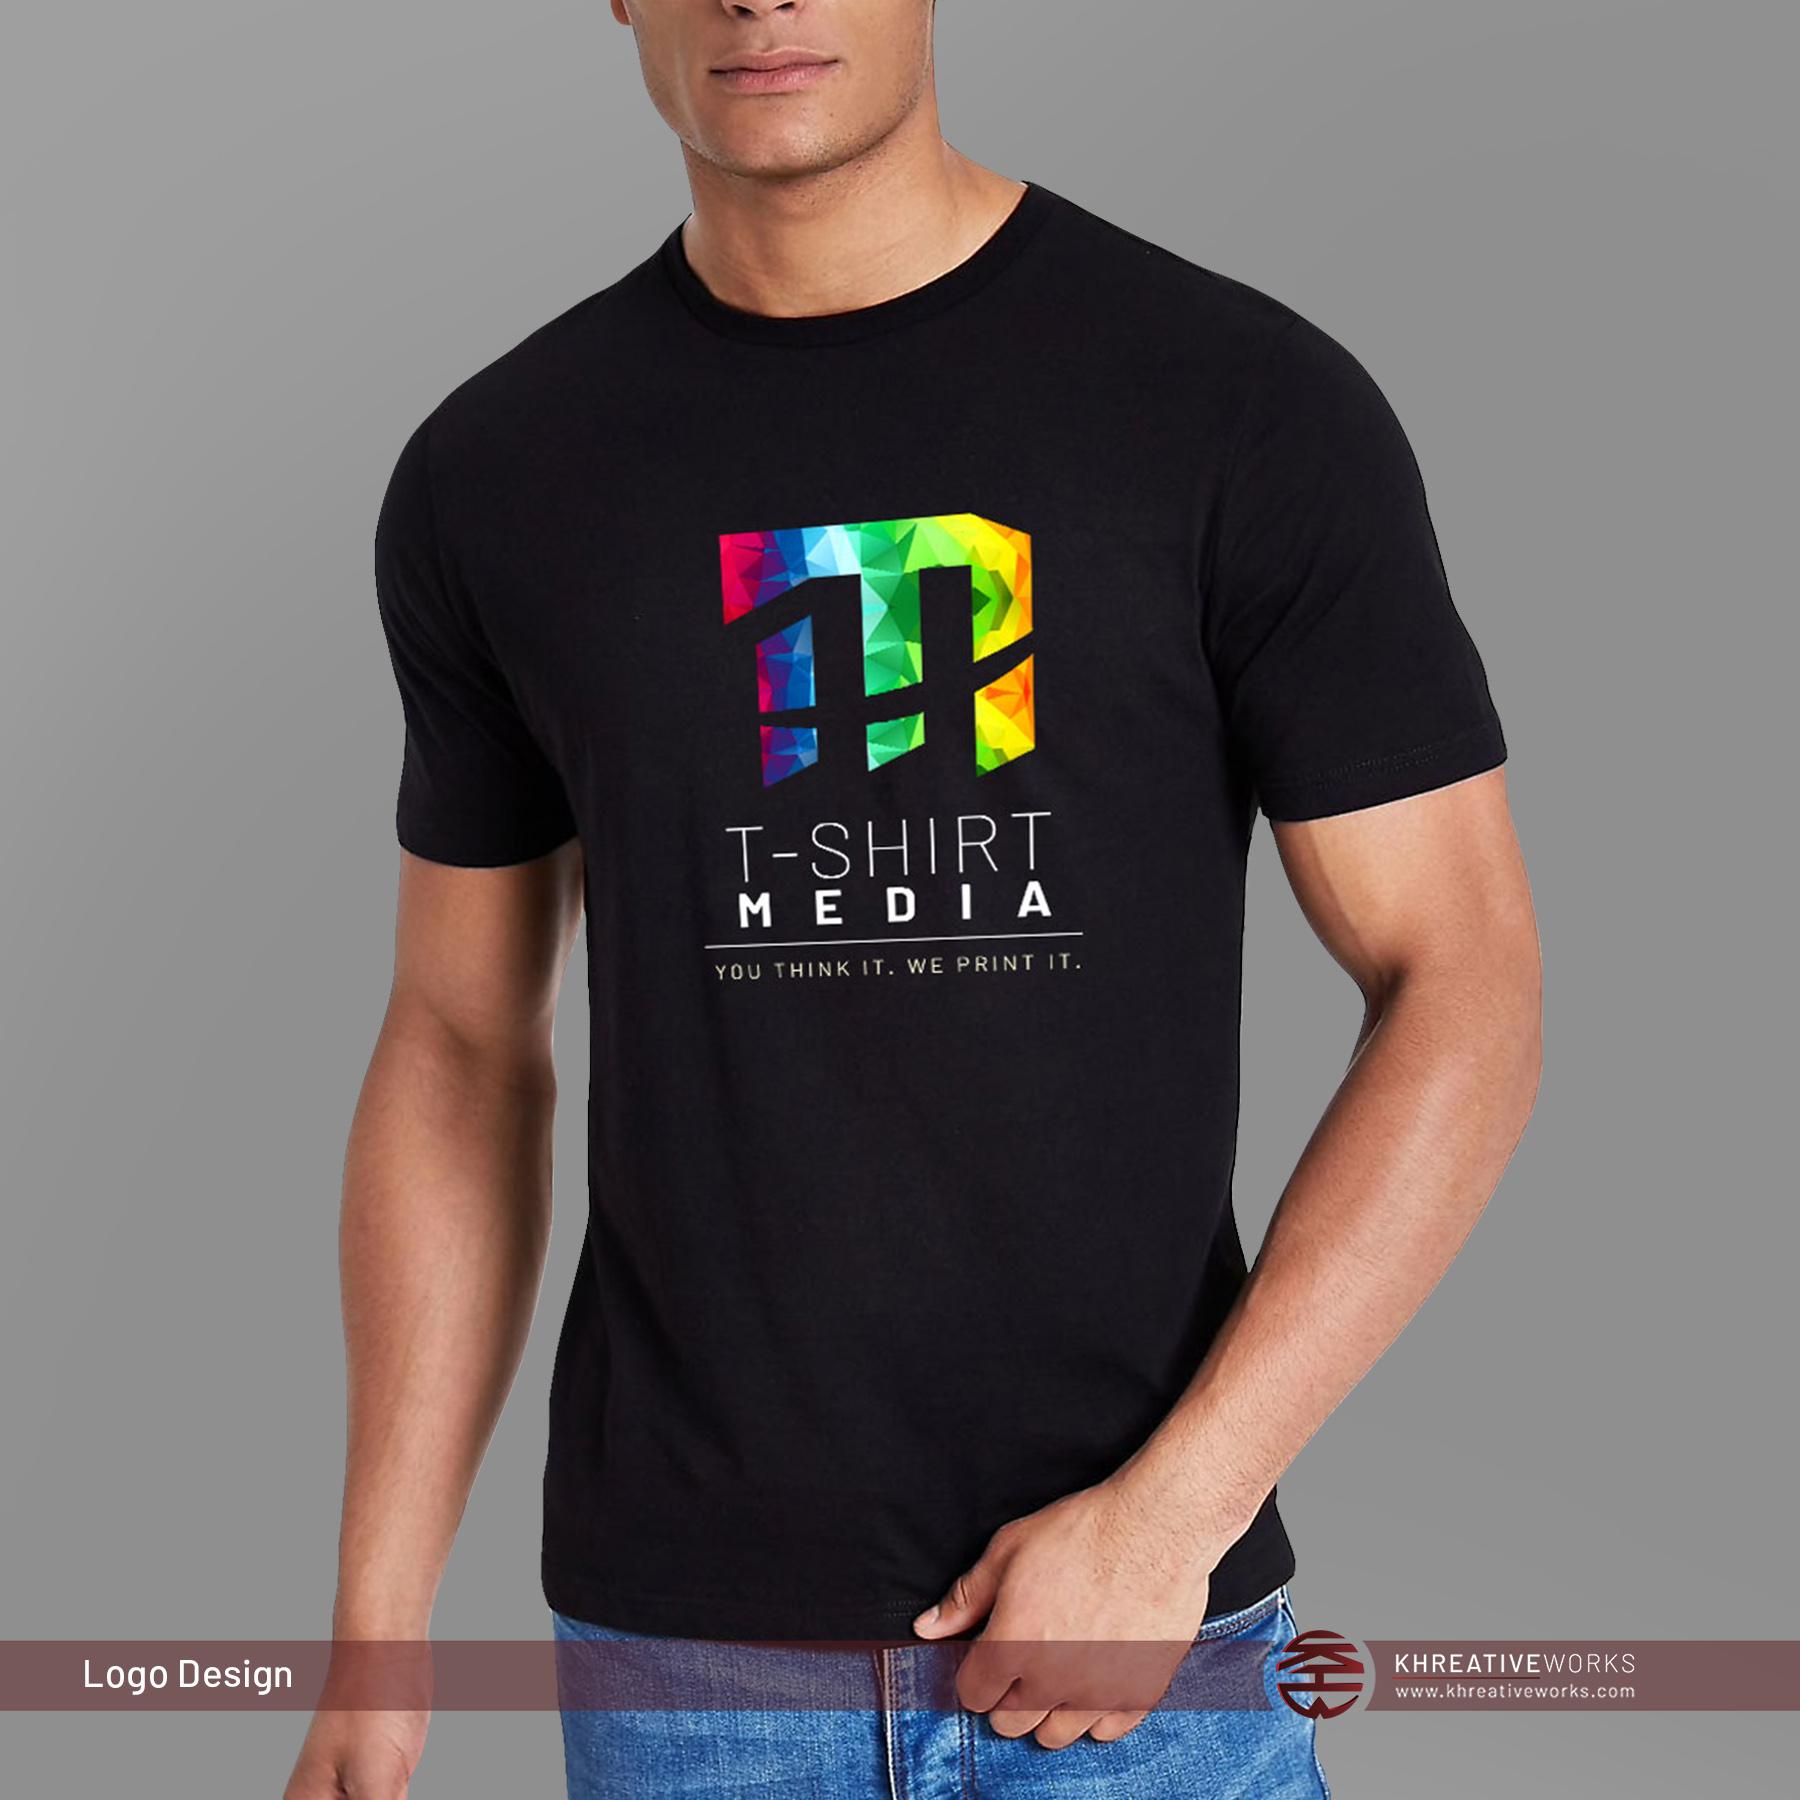 T-Shirt Media Logo Design